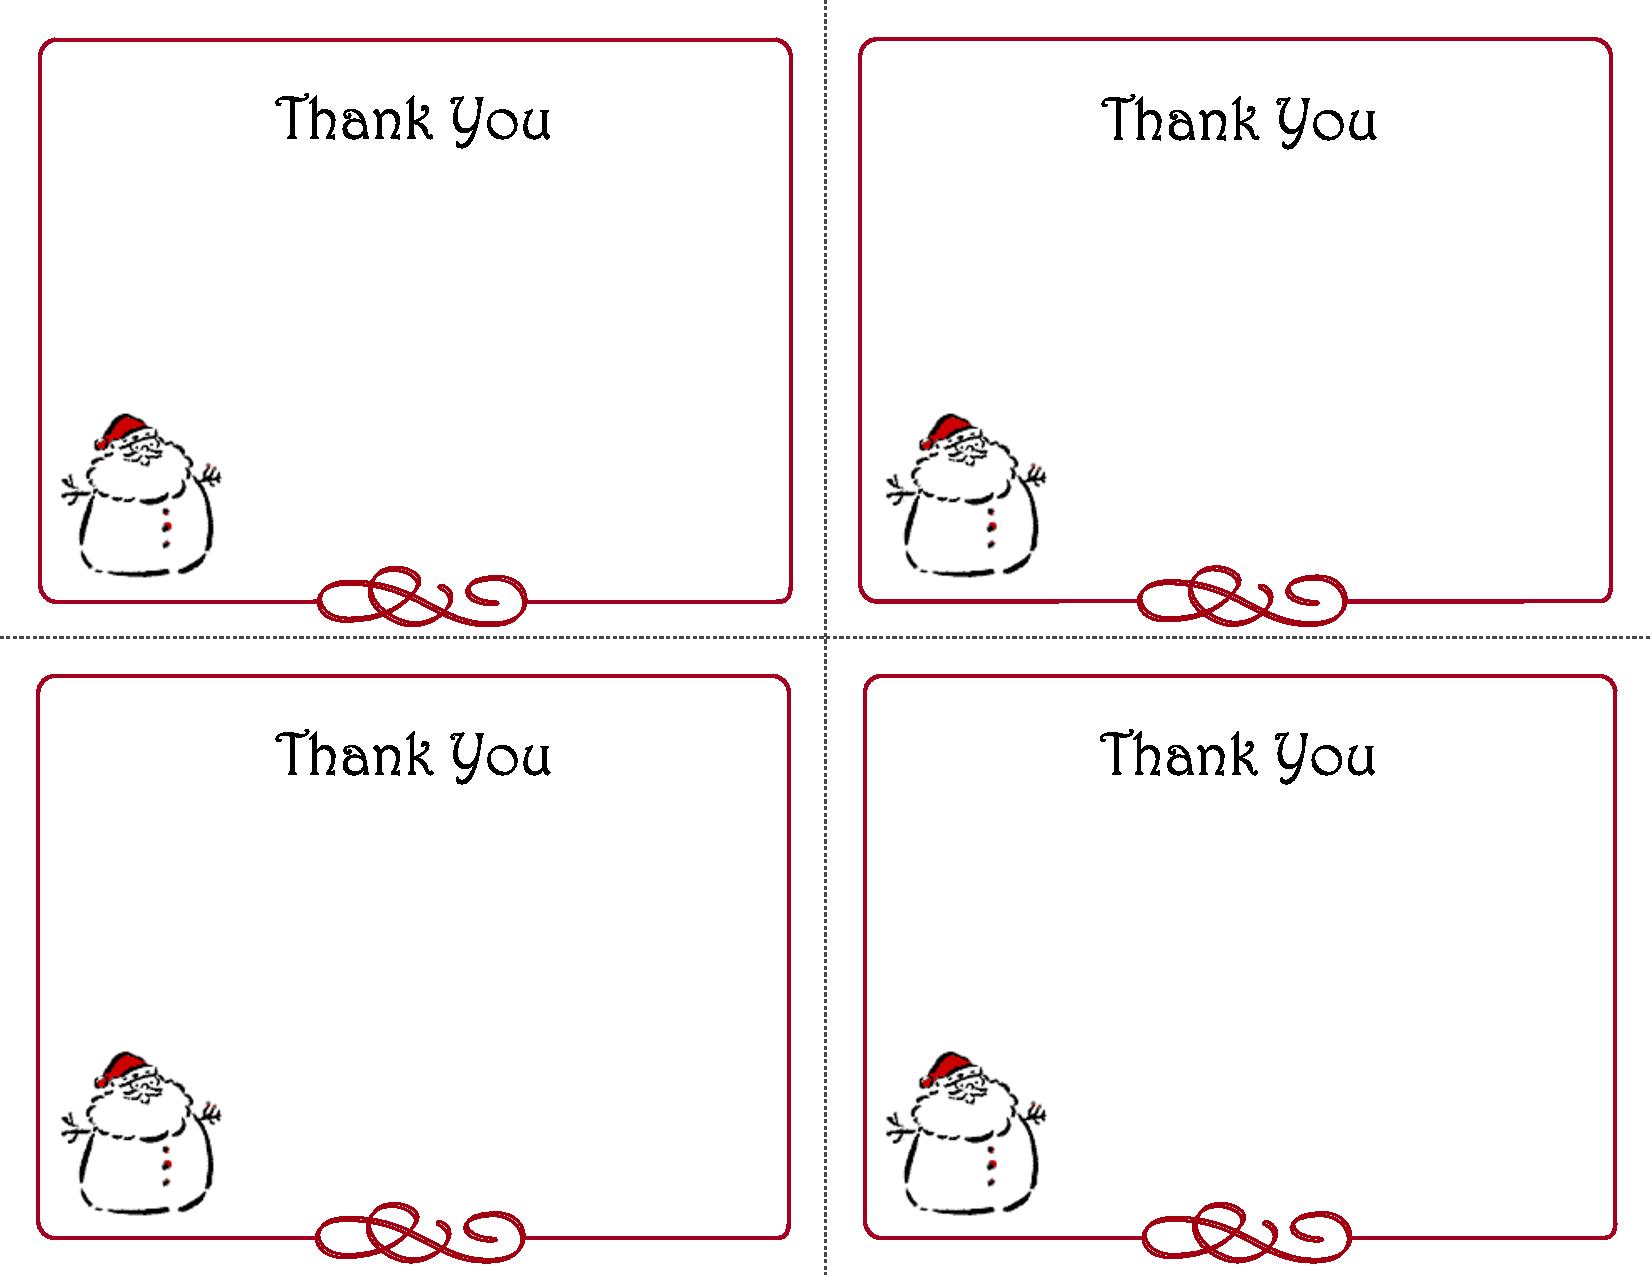 Free Thank You Cards Printable | Free Printable Holiday Gift Tags - Free Printable Thank You Tags Template